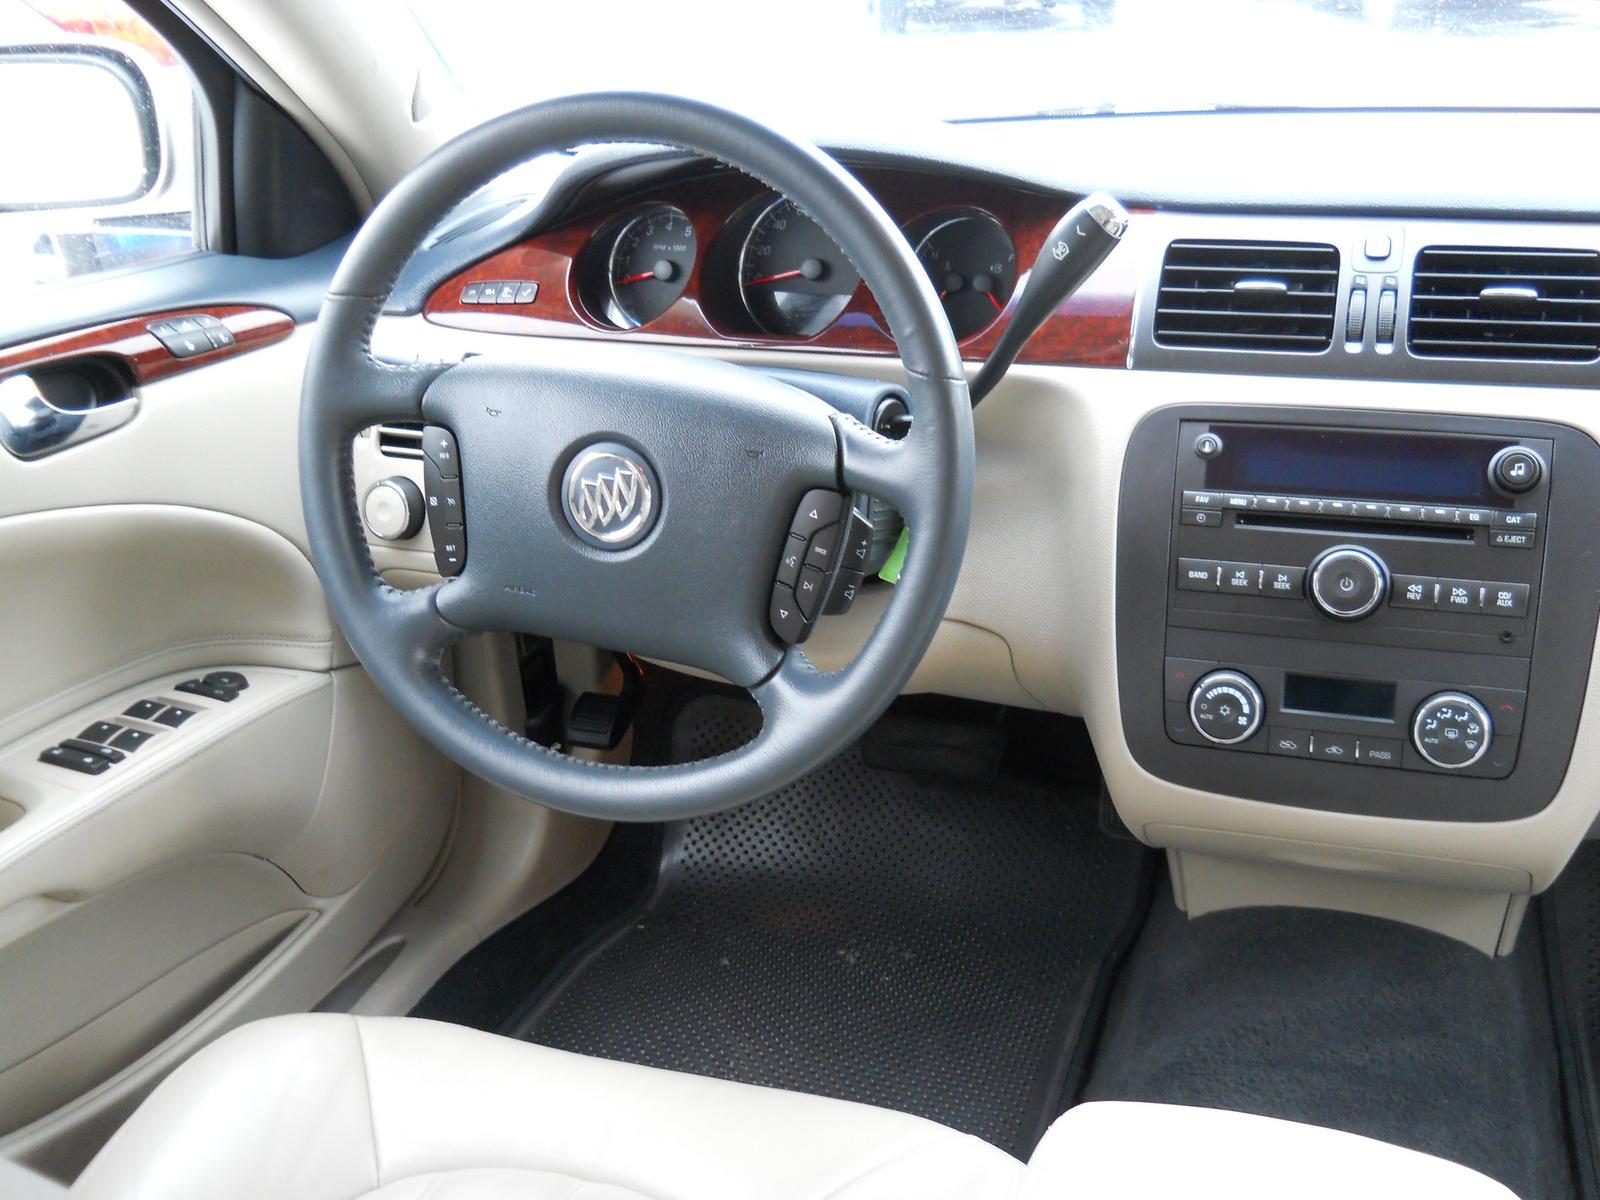 2008 Buick Lucerne Parts and Accessories: Automotive Buick lucerne interior photos